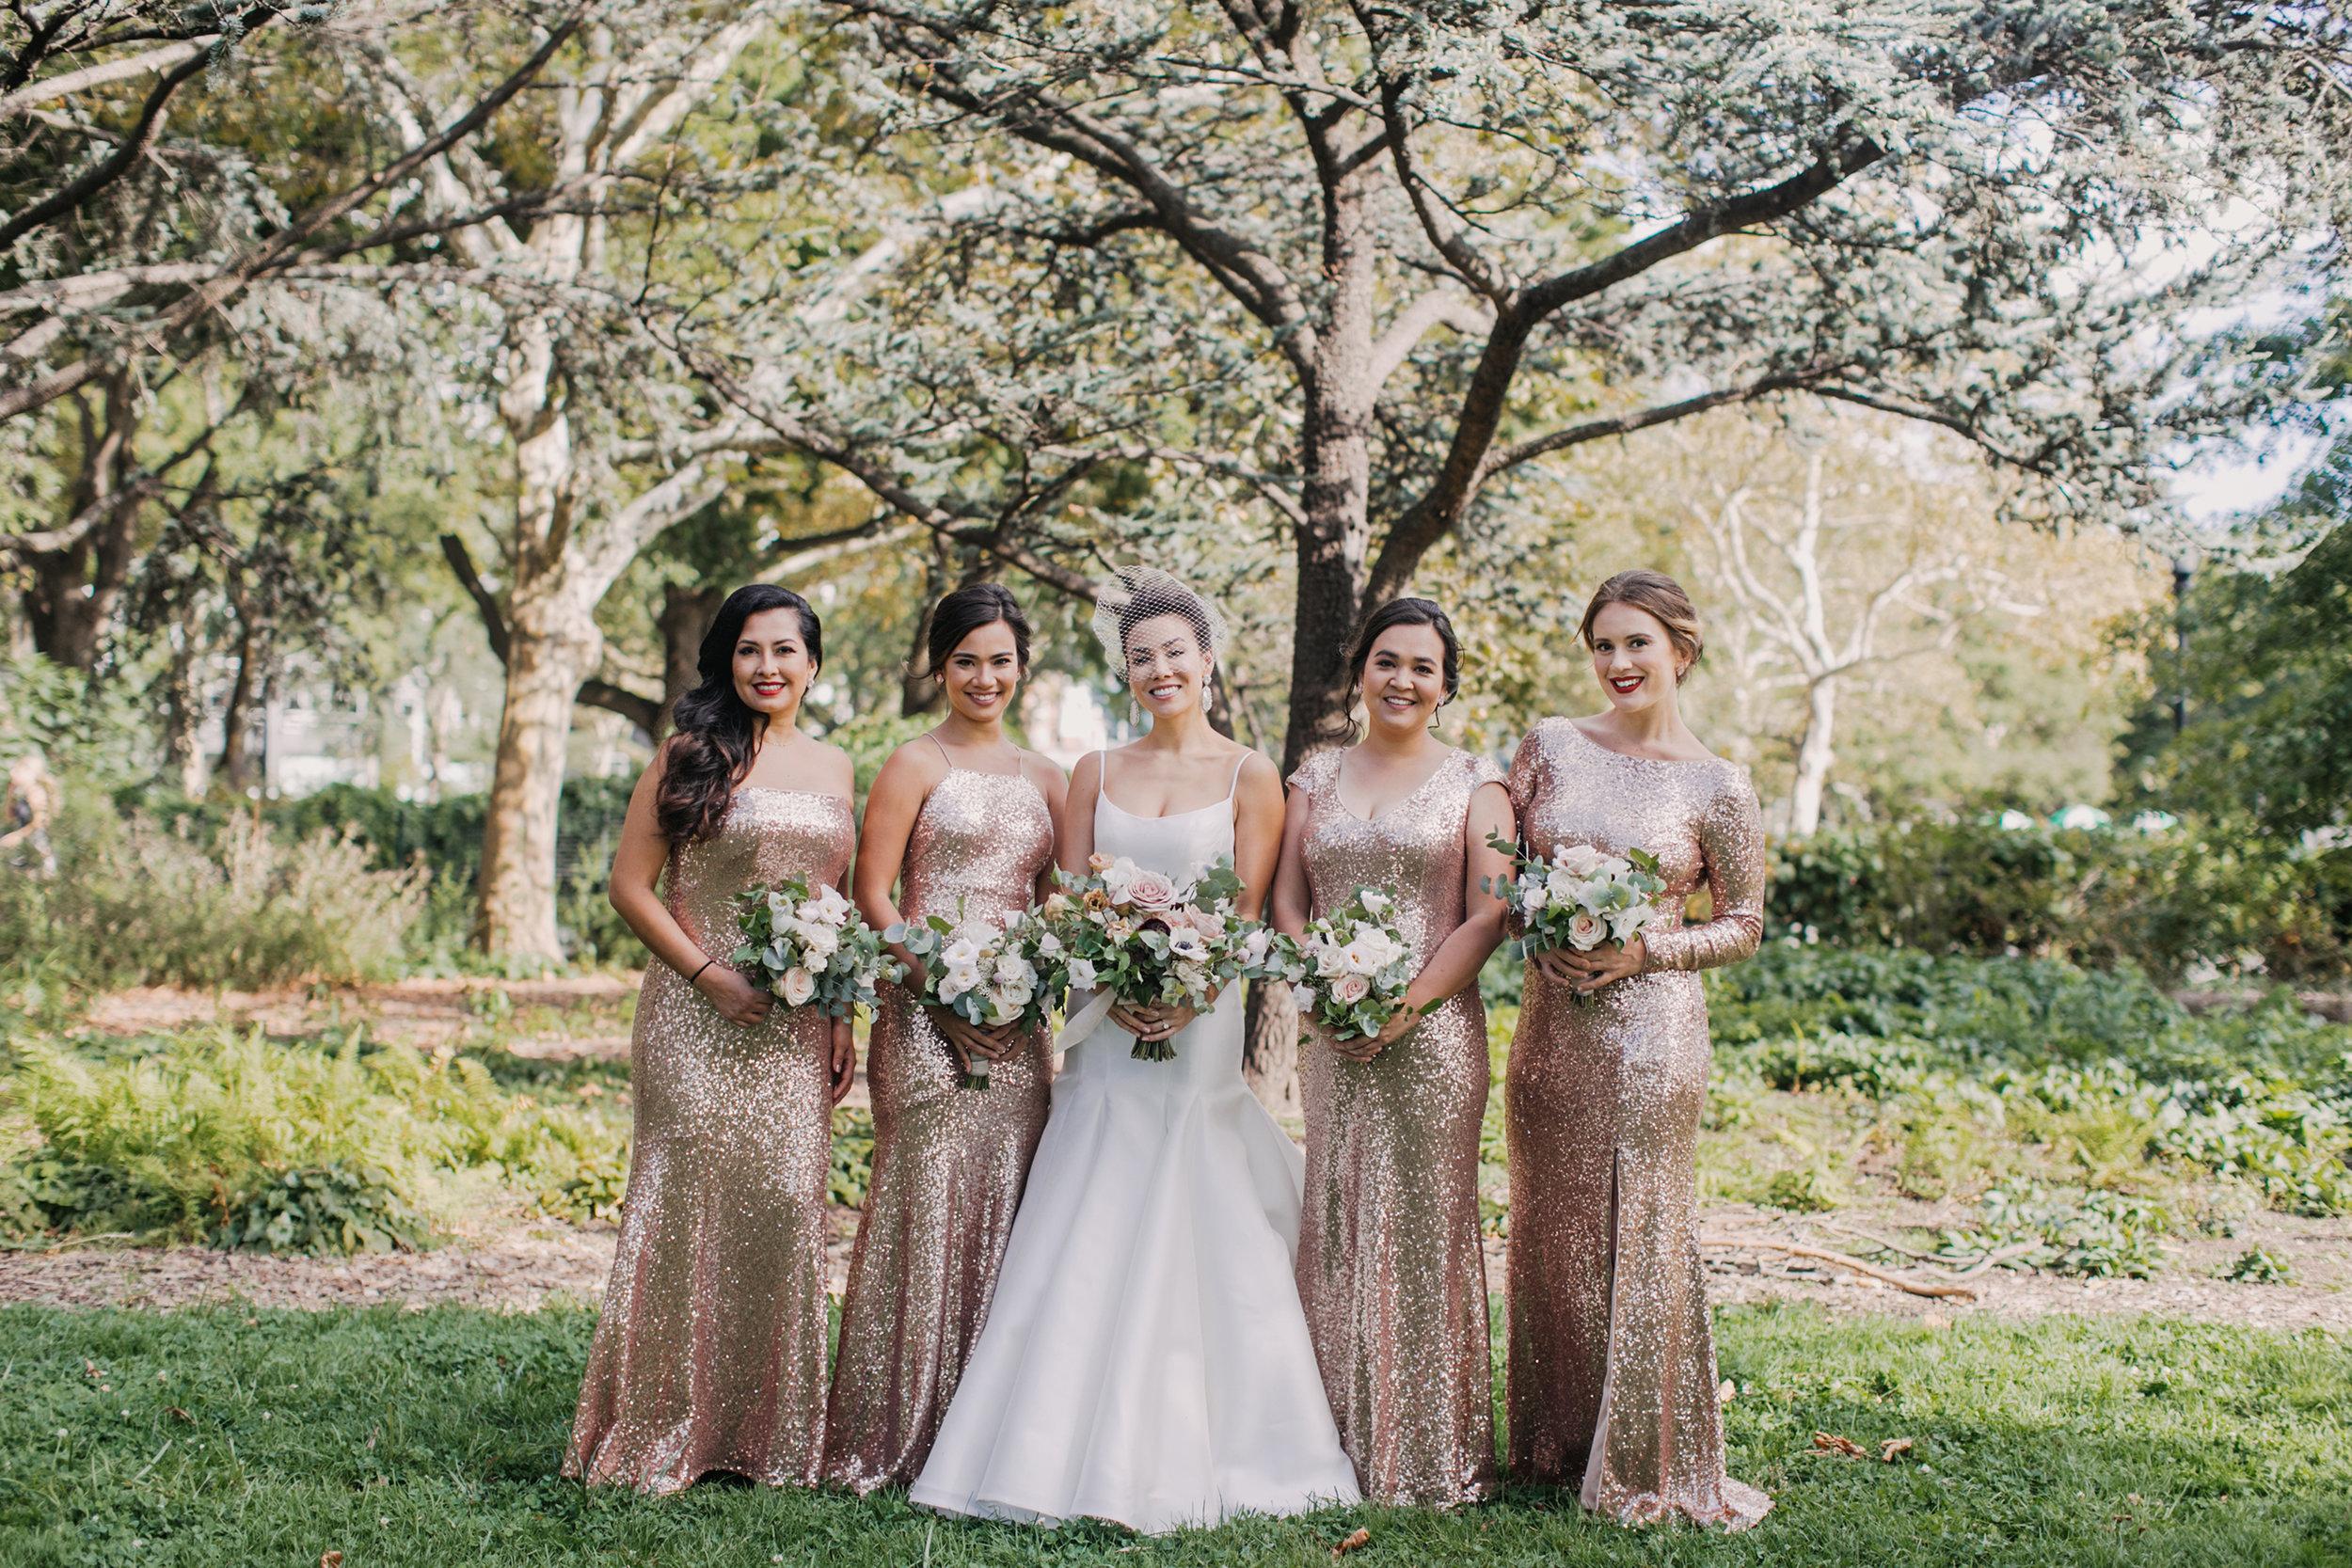 From left: Bridesmaid  Muranda , Maid of Honor (younger sister)  Andrea , Matron of Honor (older sister) Meileen, Bridesmaid  Alexa